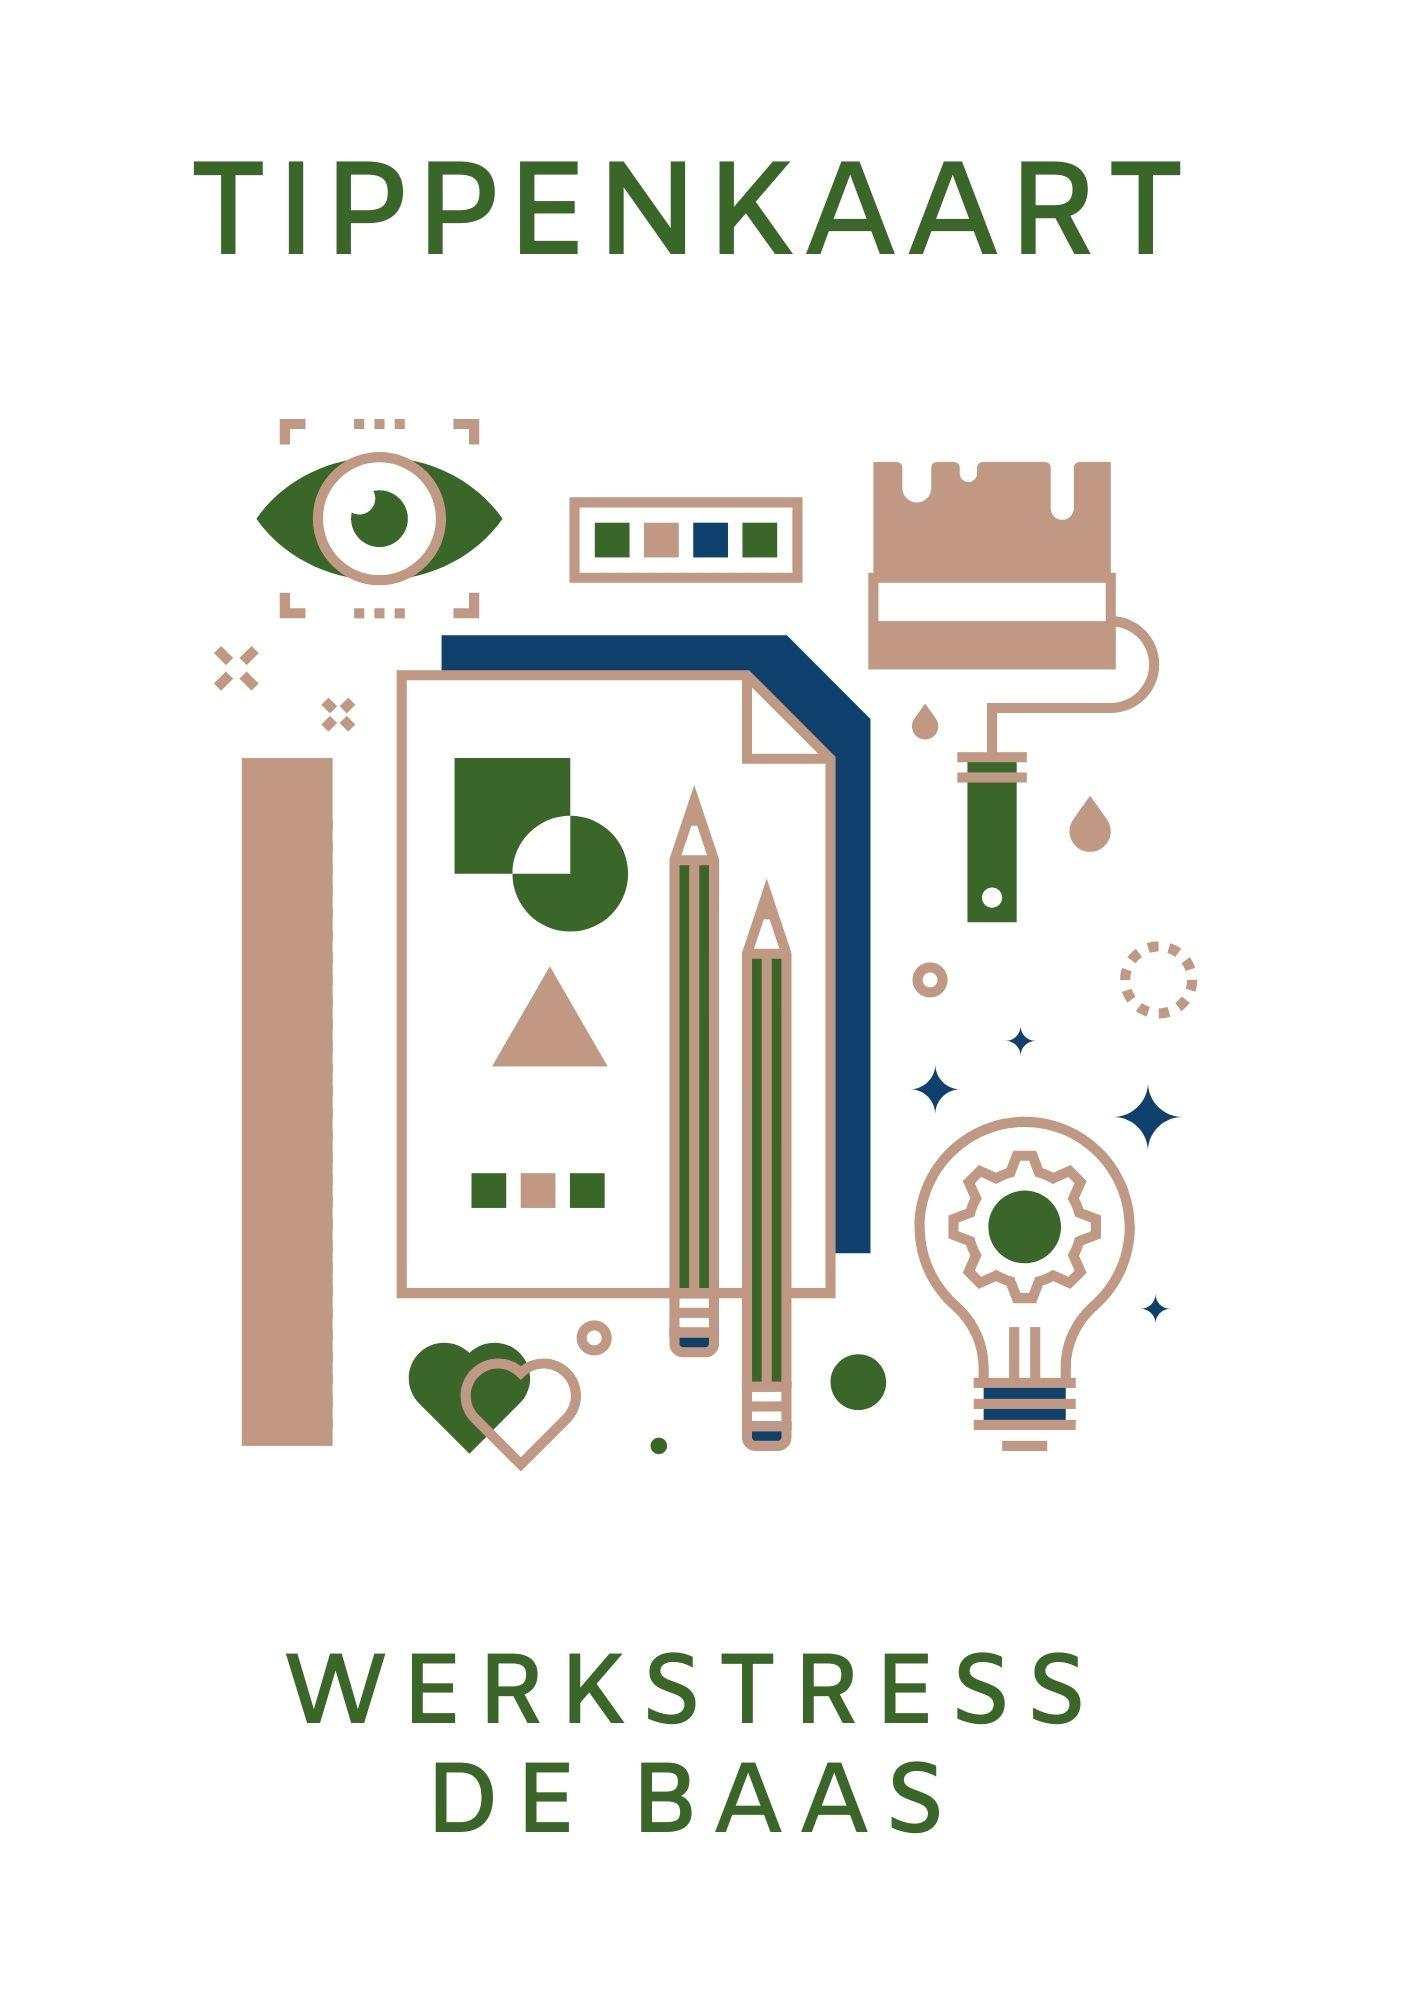 Tippenkaart Werkstress de baas